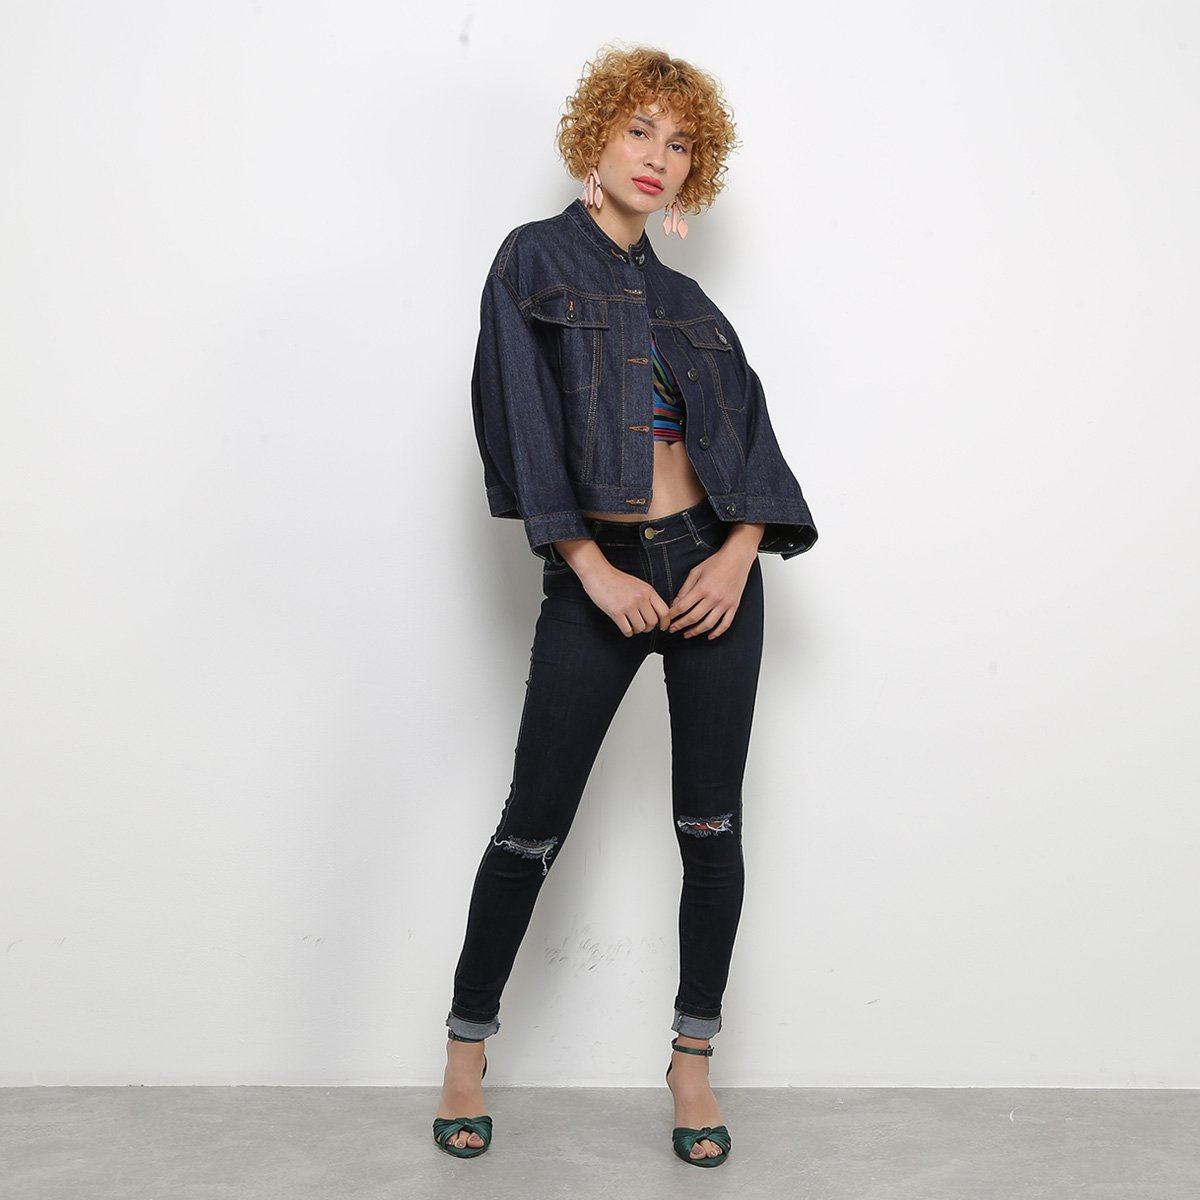 Jaqueta Jeans Colcci Cropped Feminina - Tam: P - 2